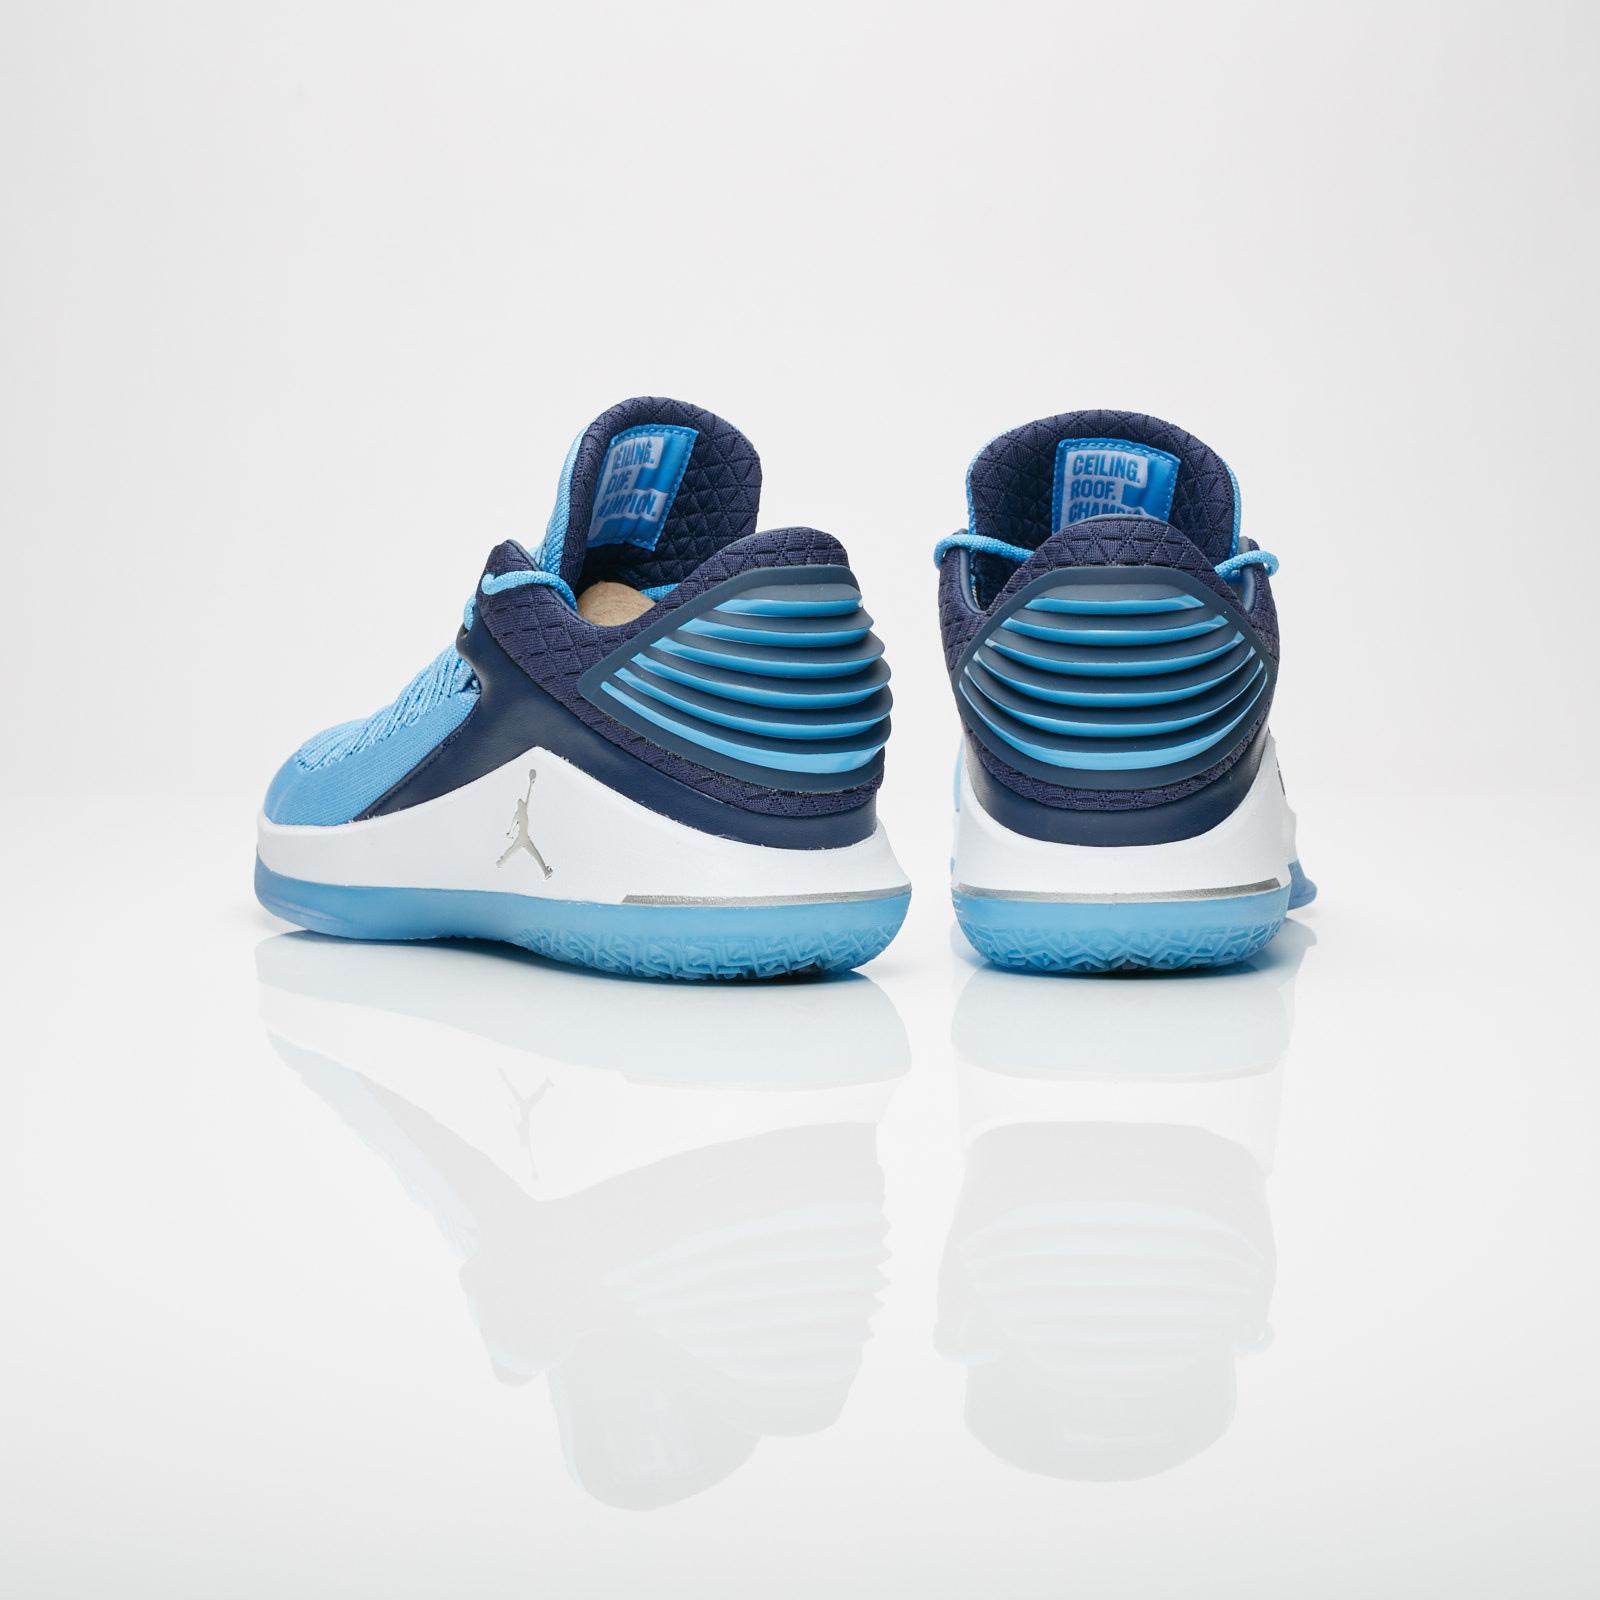 db9c65d185ee8c Jordan Brand Air Jordan XXXII Low - Aa1256-401 - Sneakersnstuff ...